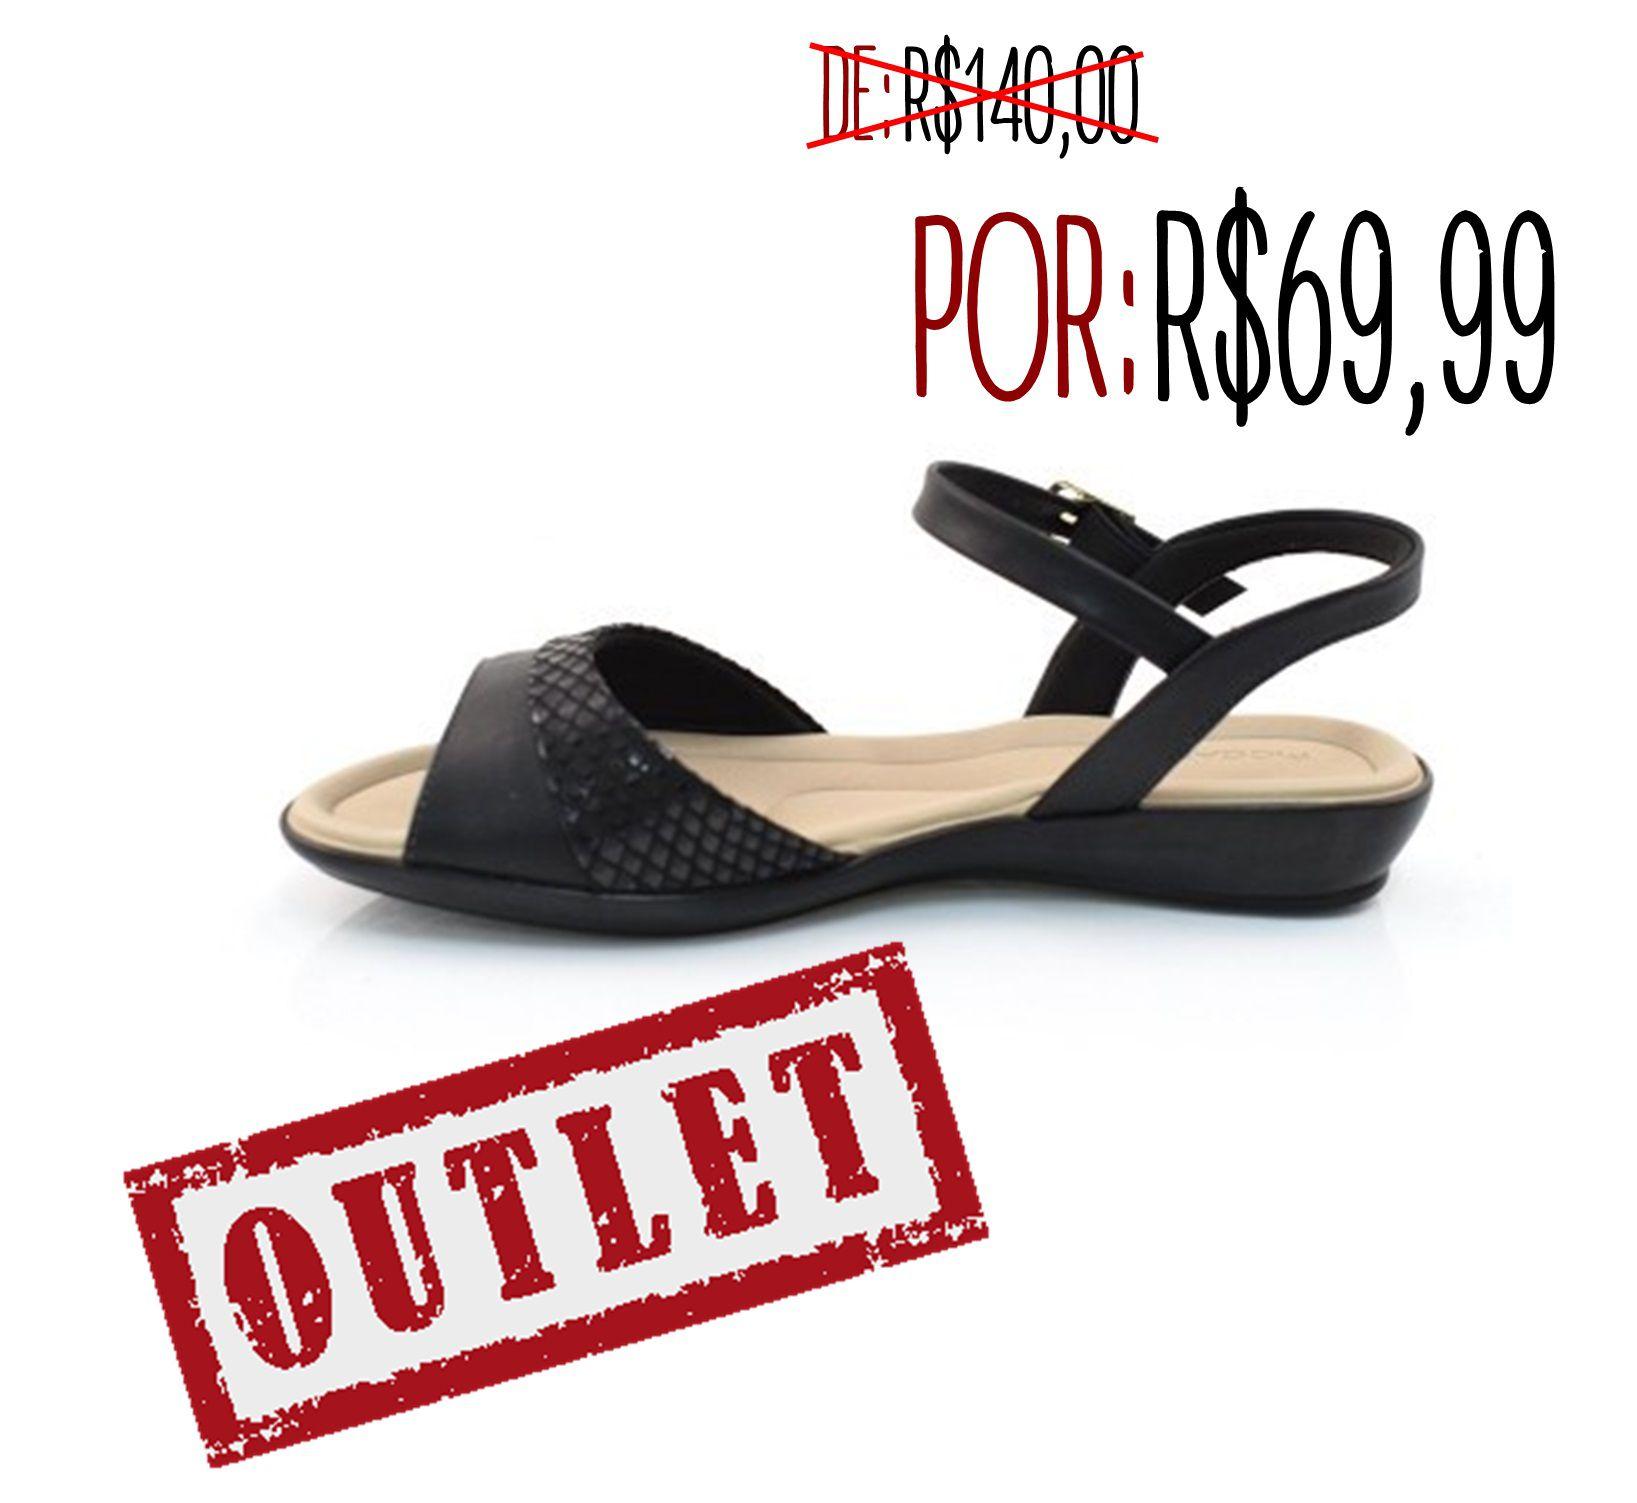 9f40312c9f Sandália Anabela Baixa Piccadilly Confortável Sola Leve